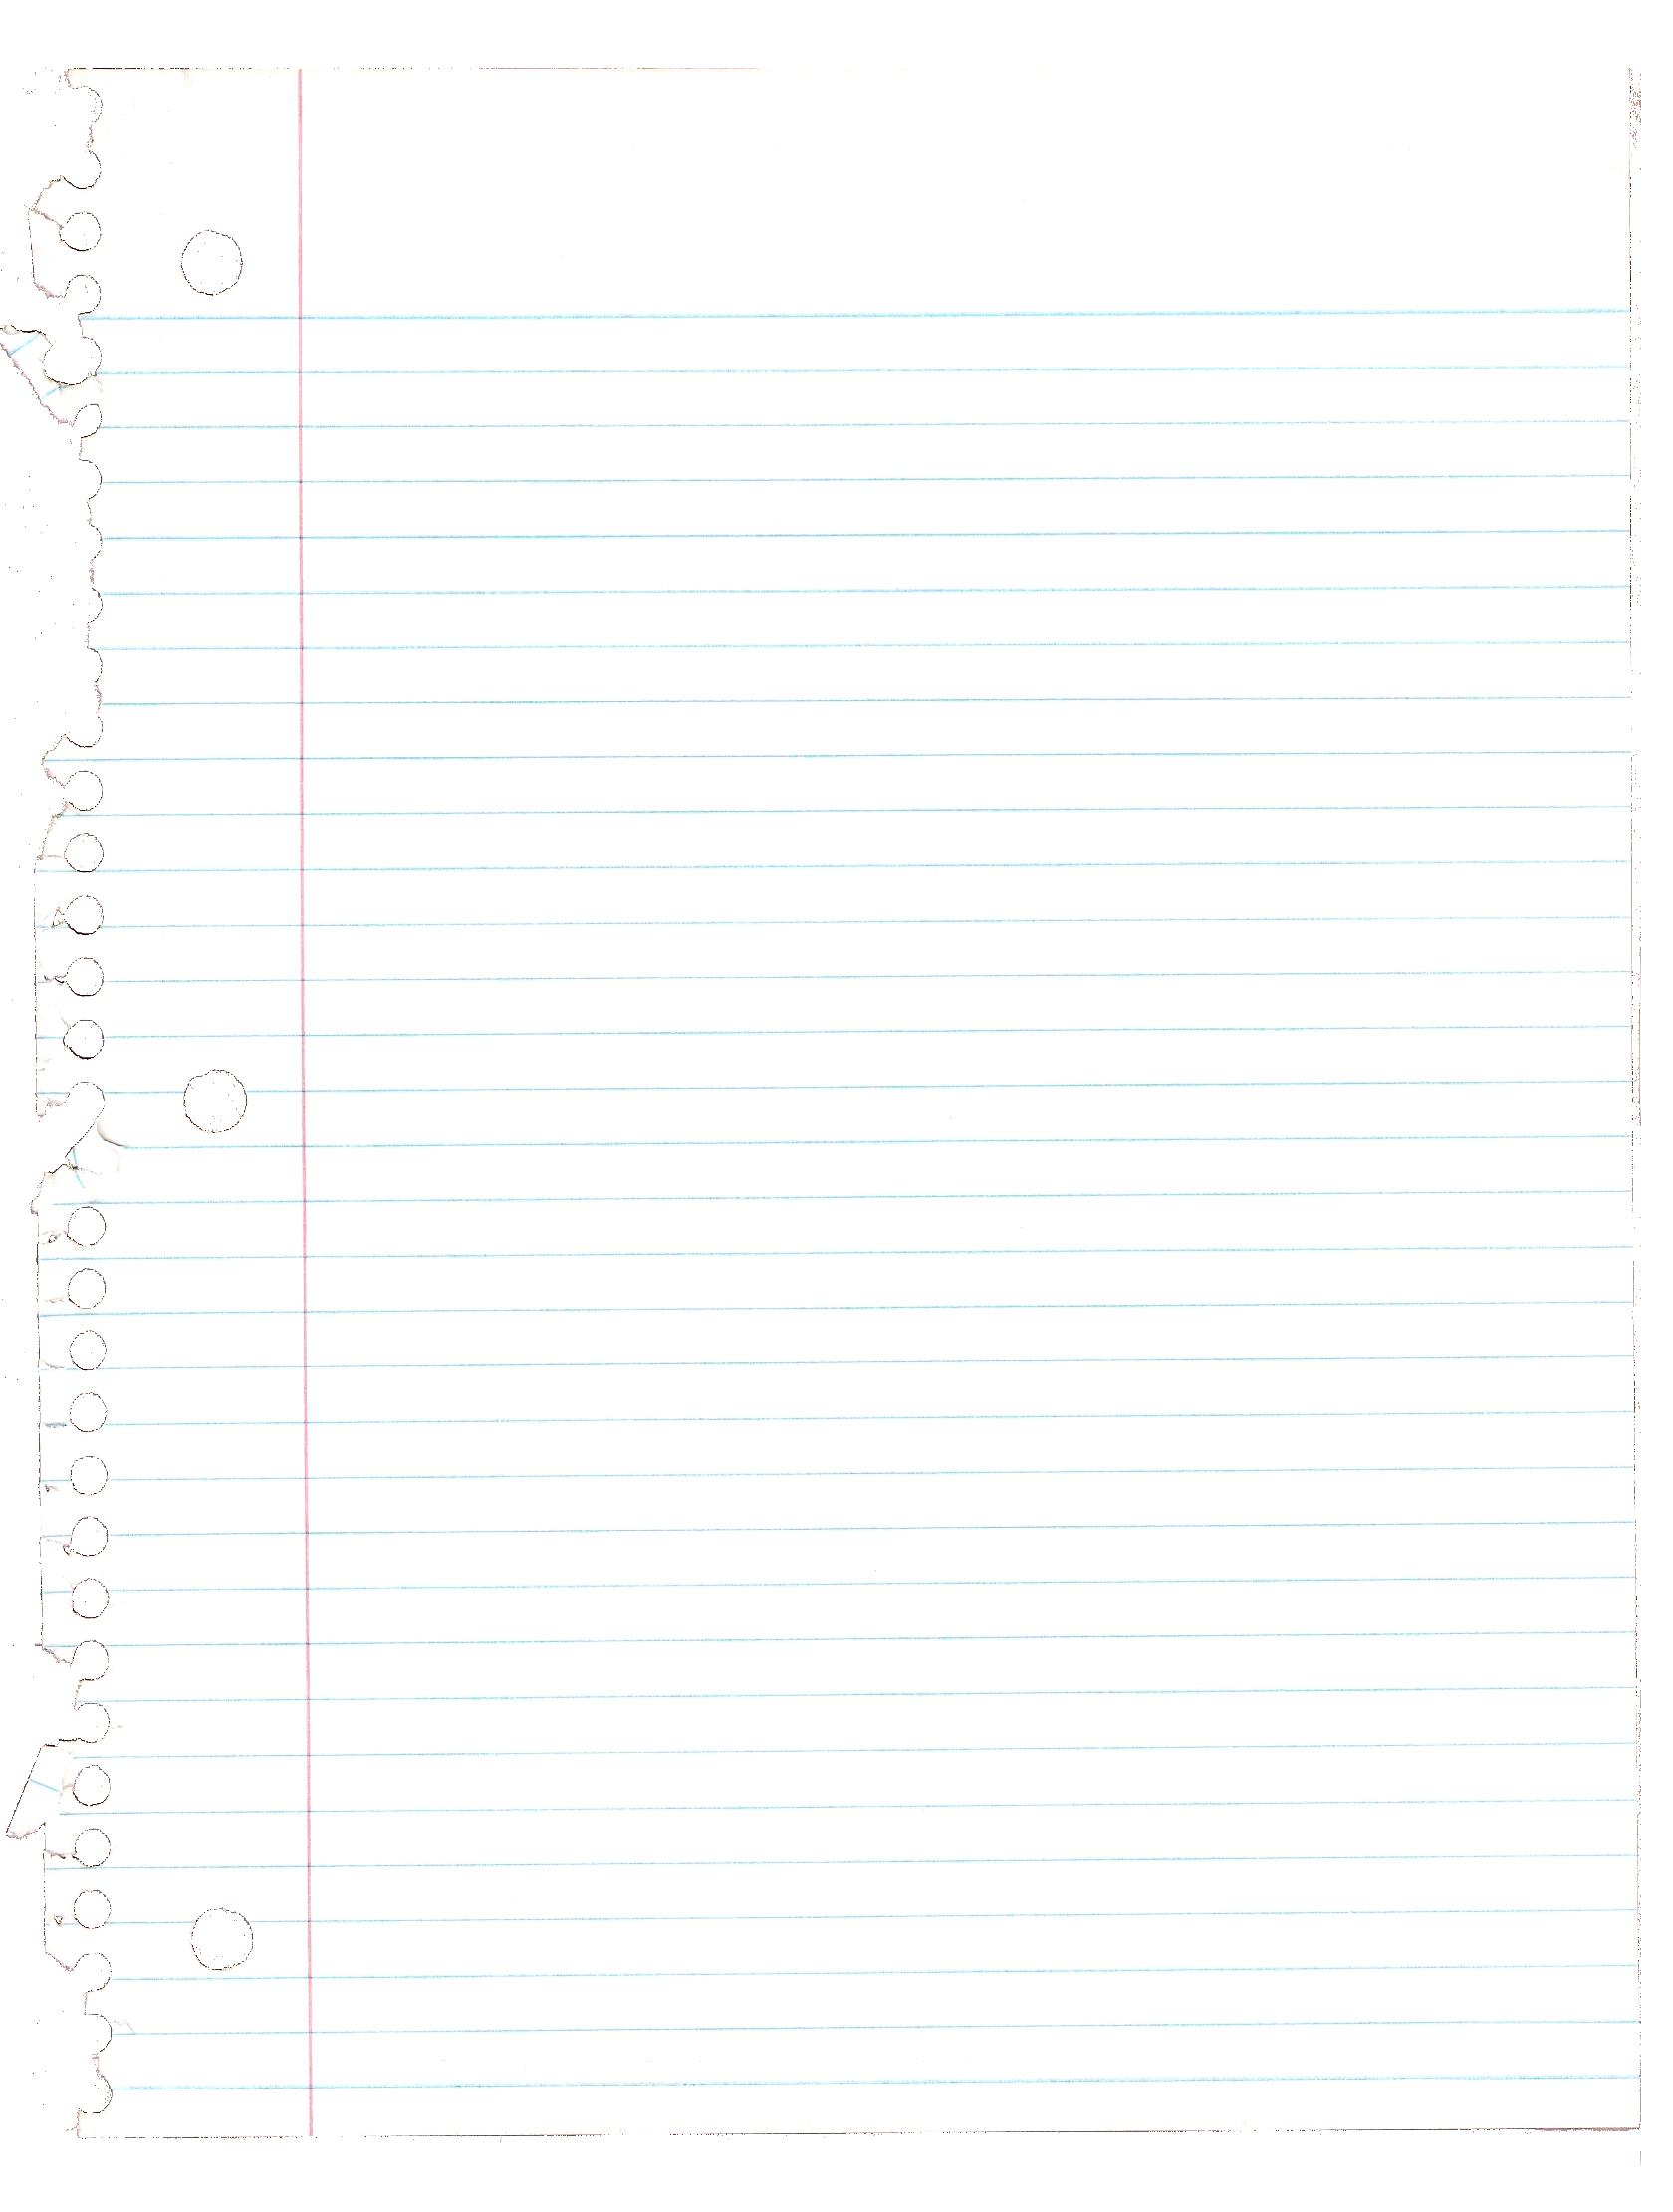 The notebook wallpaper wallpapersafari - Wallpaper notebook paper ...